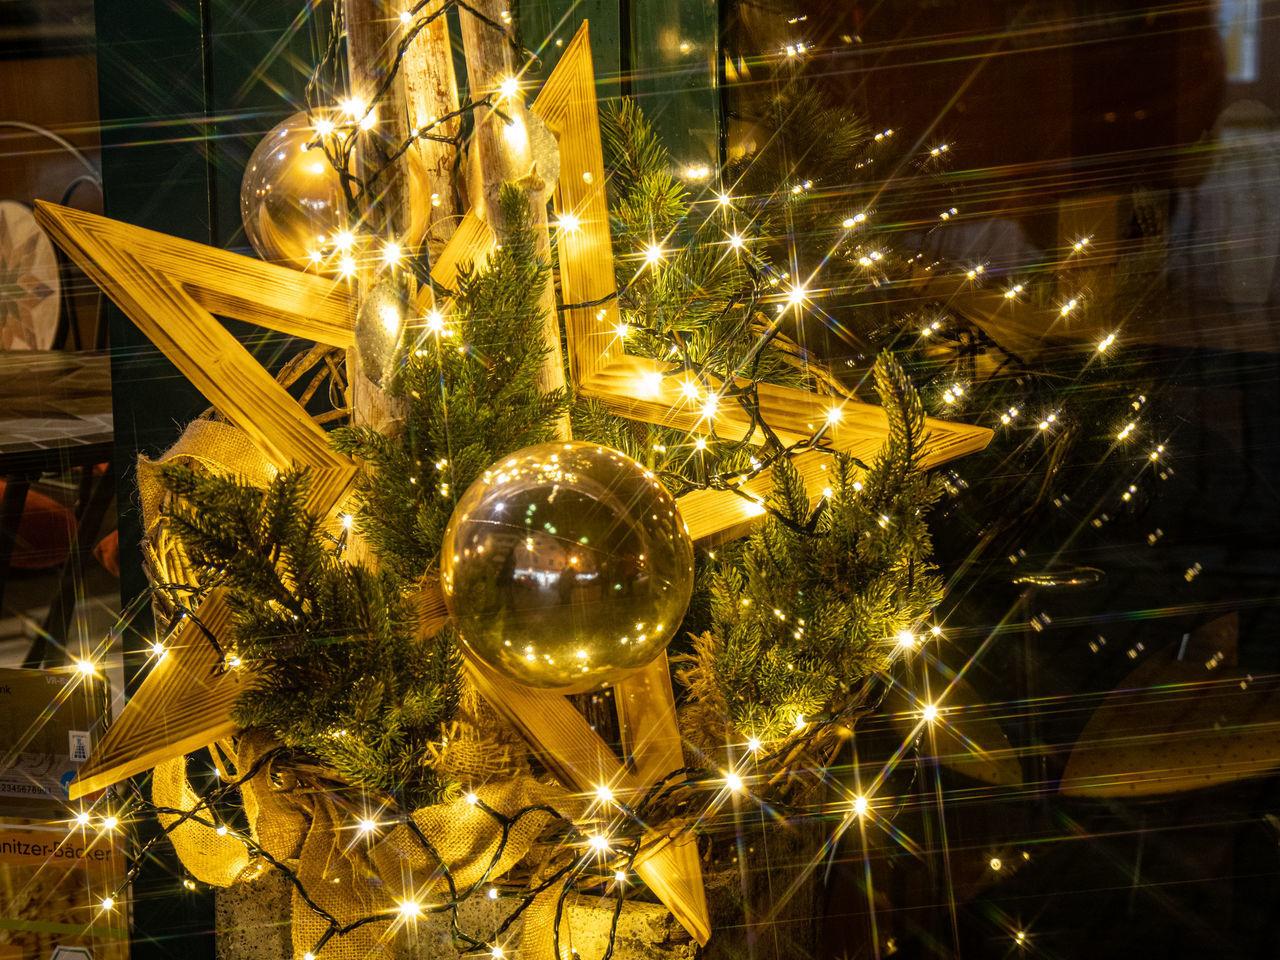 illuminated, decoration, celebration, christmas, holiday, christmas decoration, night, lighting equipment, christmas lights, holiday - event, no people, tree, glowing, christmas ornament, christmas tree, celebration event, hanging, low angle view, light, electricity